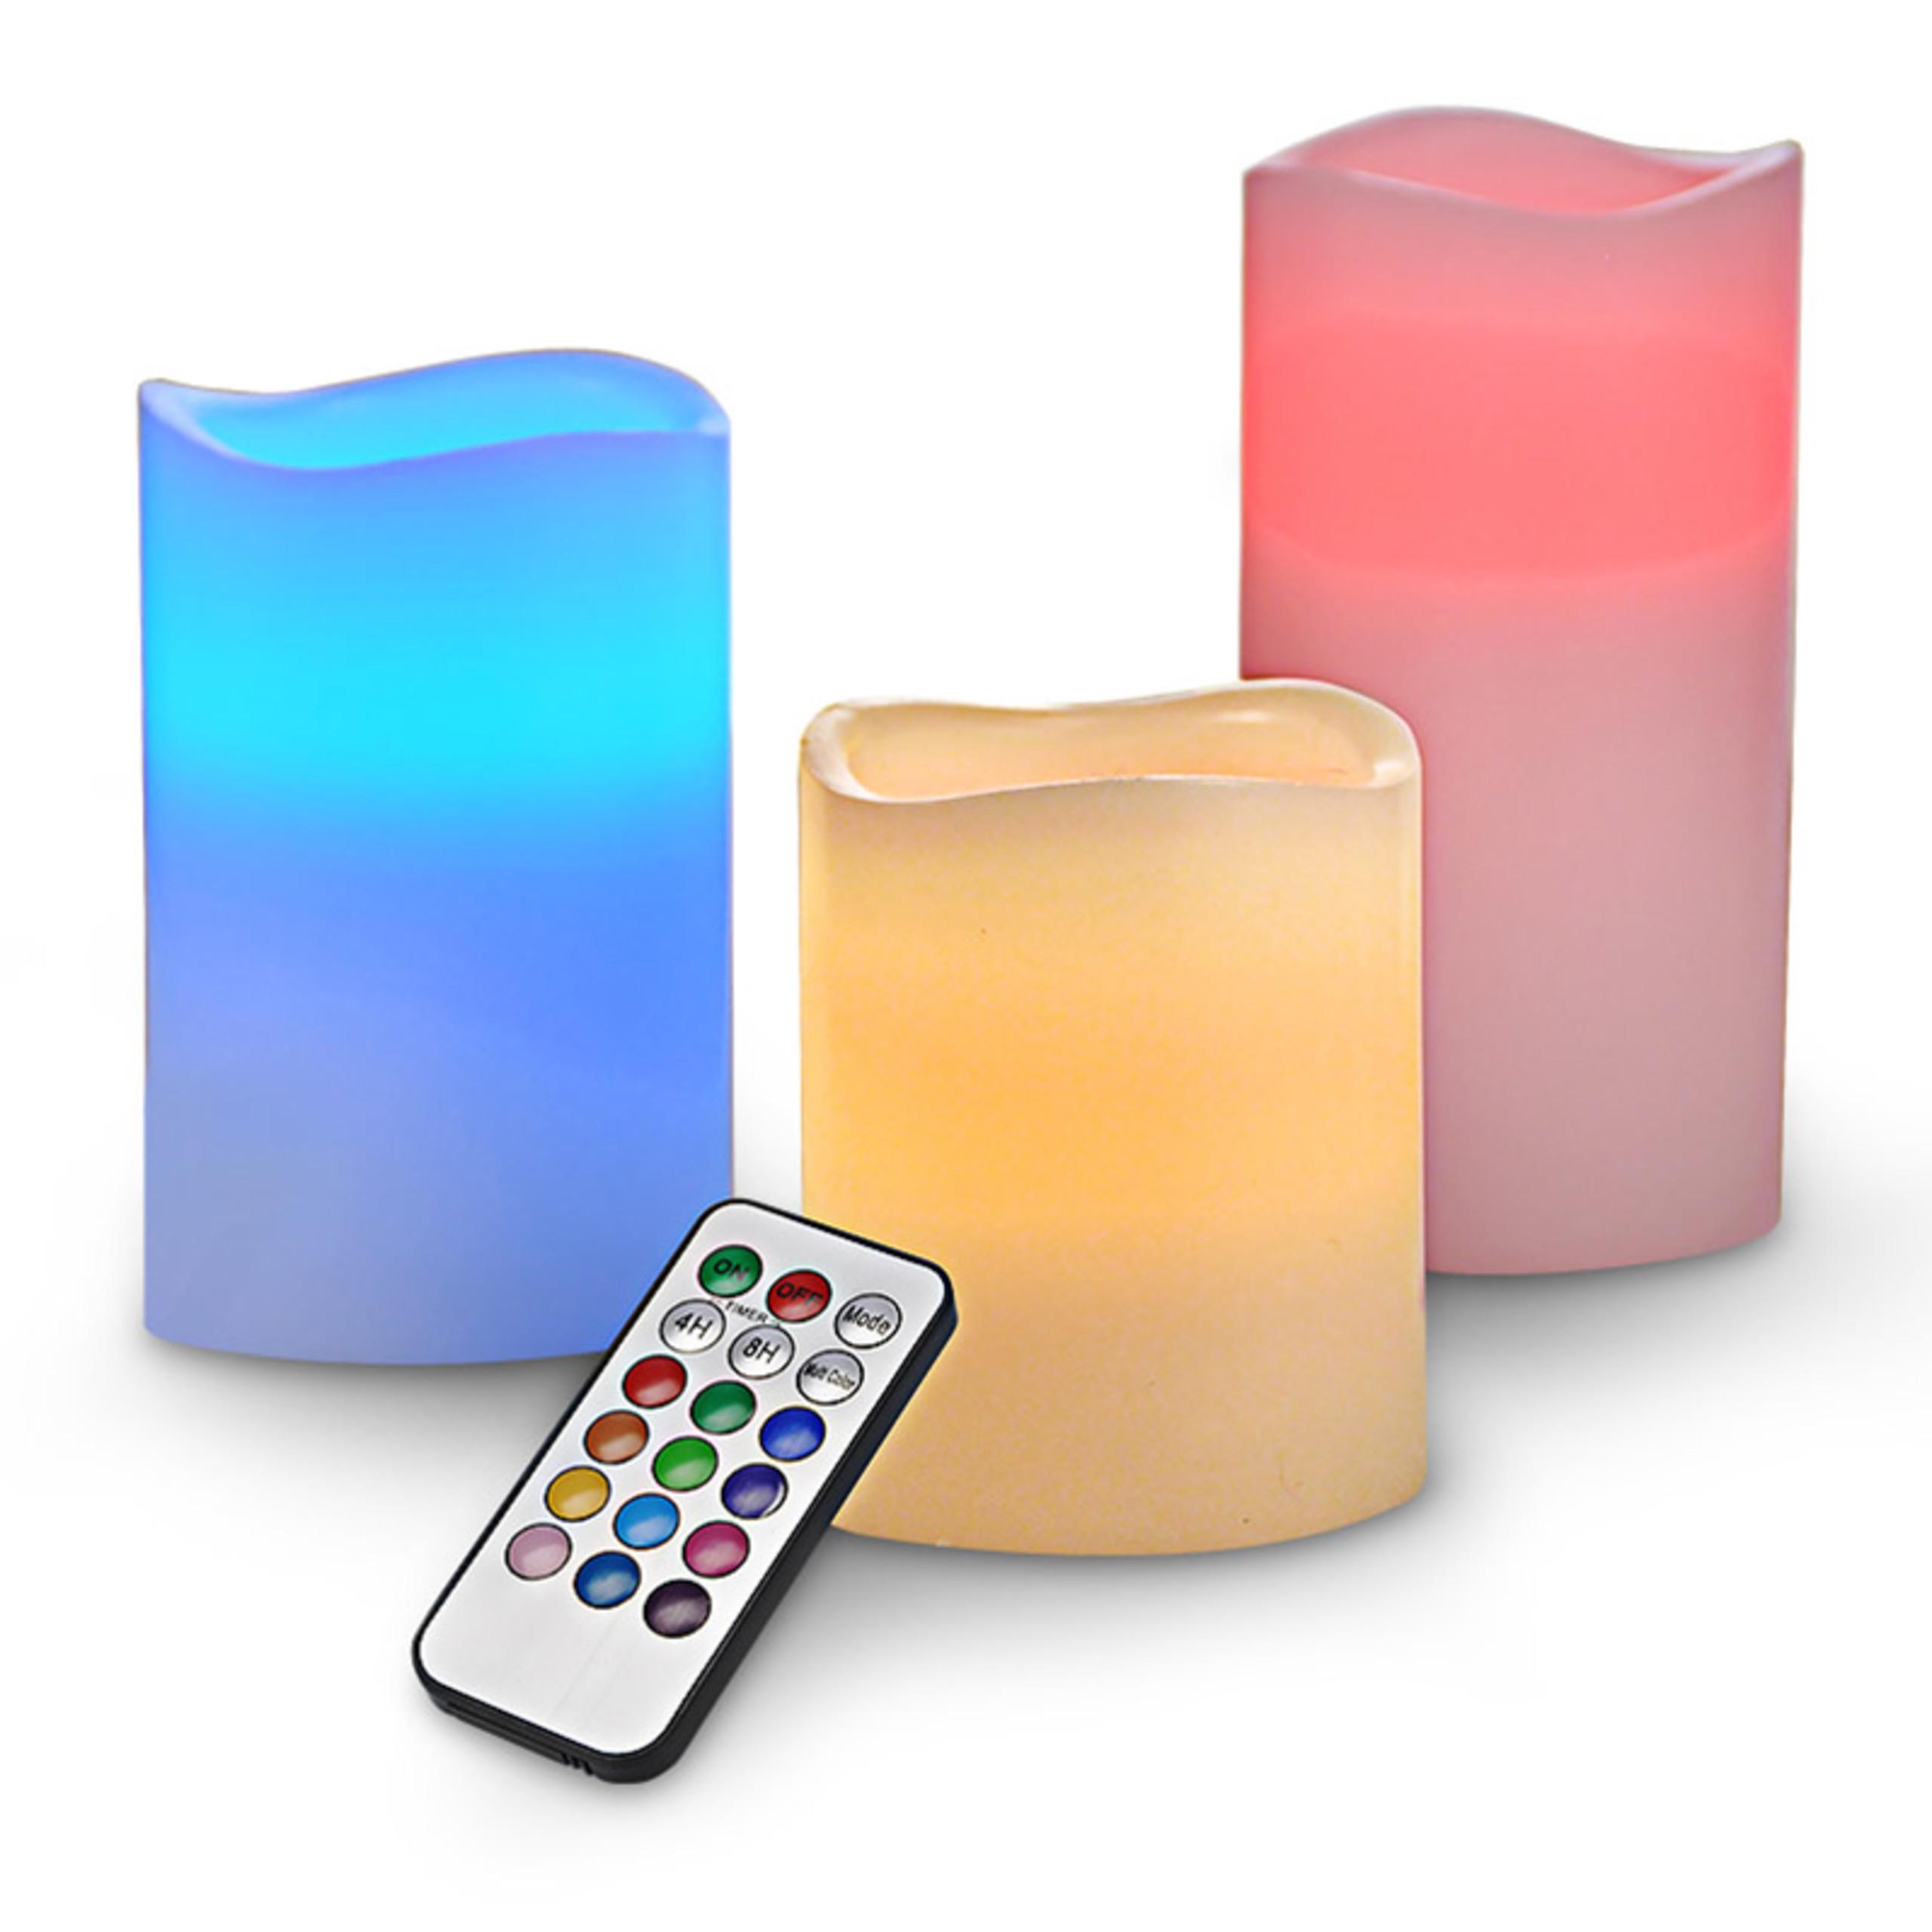 3x-LED-Kerzen-flammenlose-Echtwachskerzen-mit-Farbwechsel-Fernbedienung-Timer